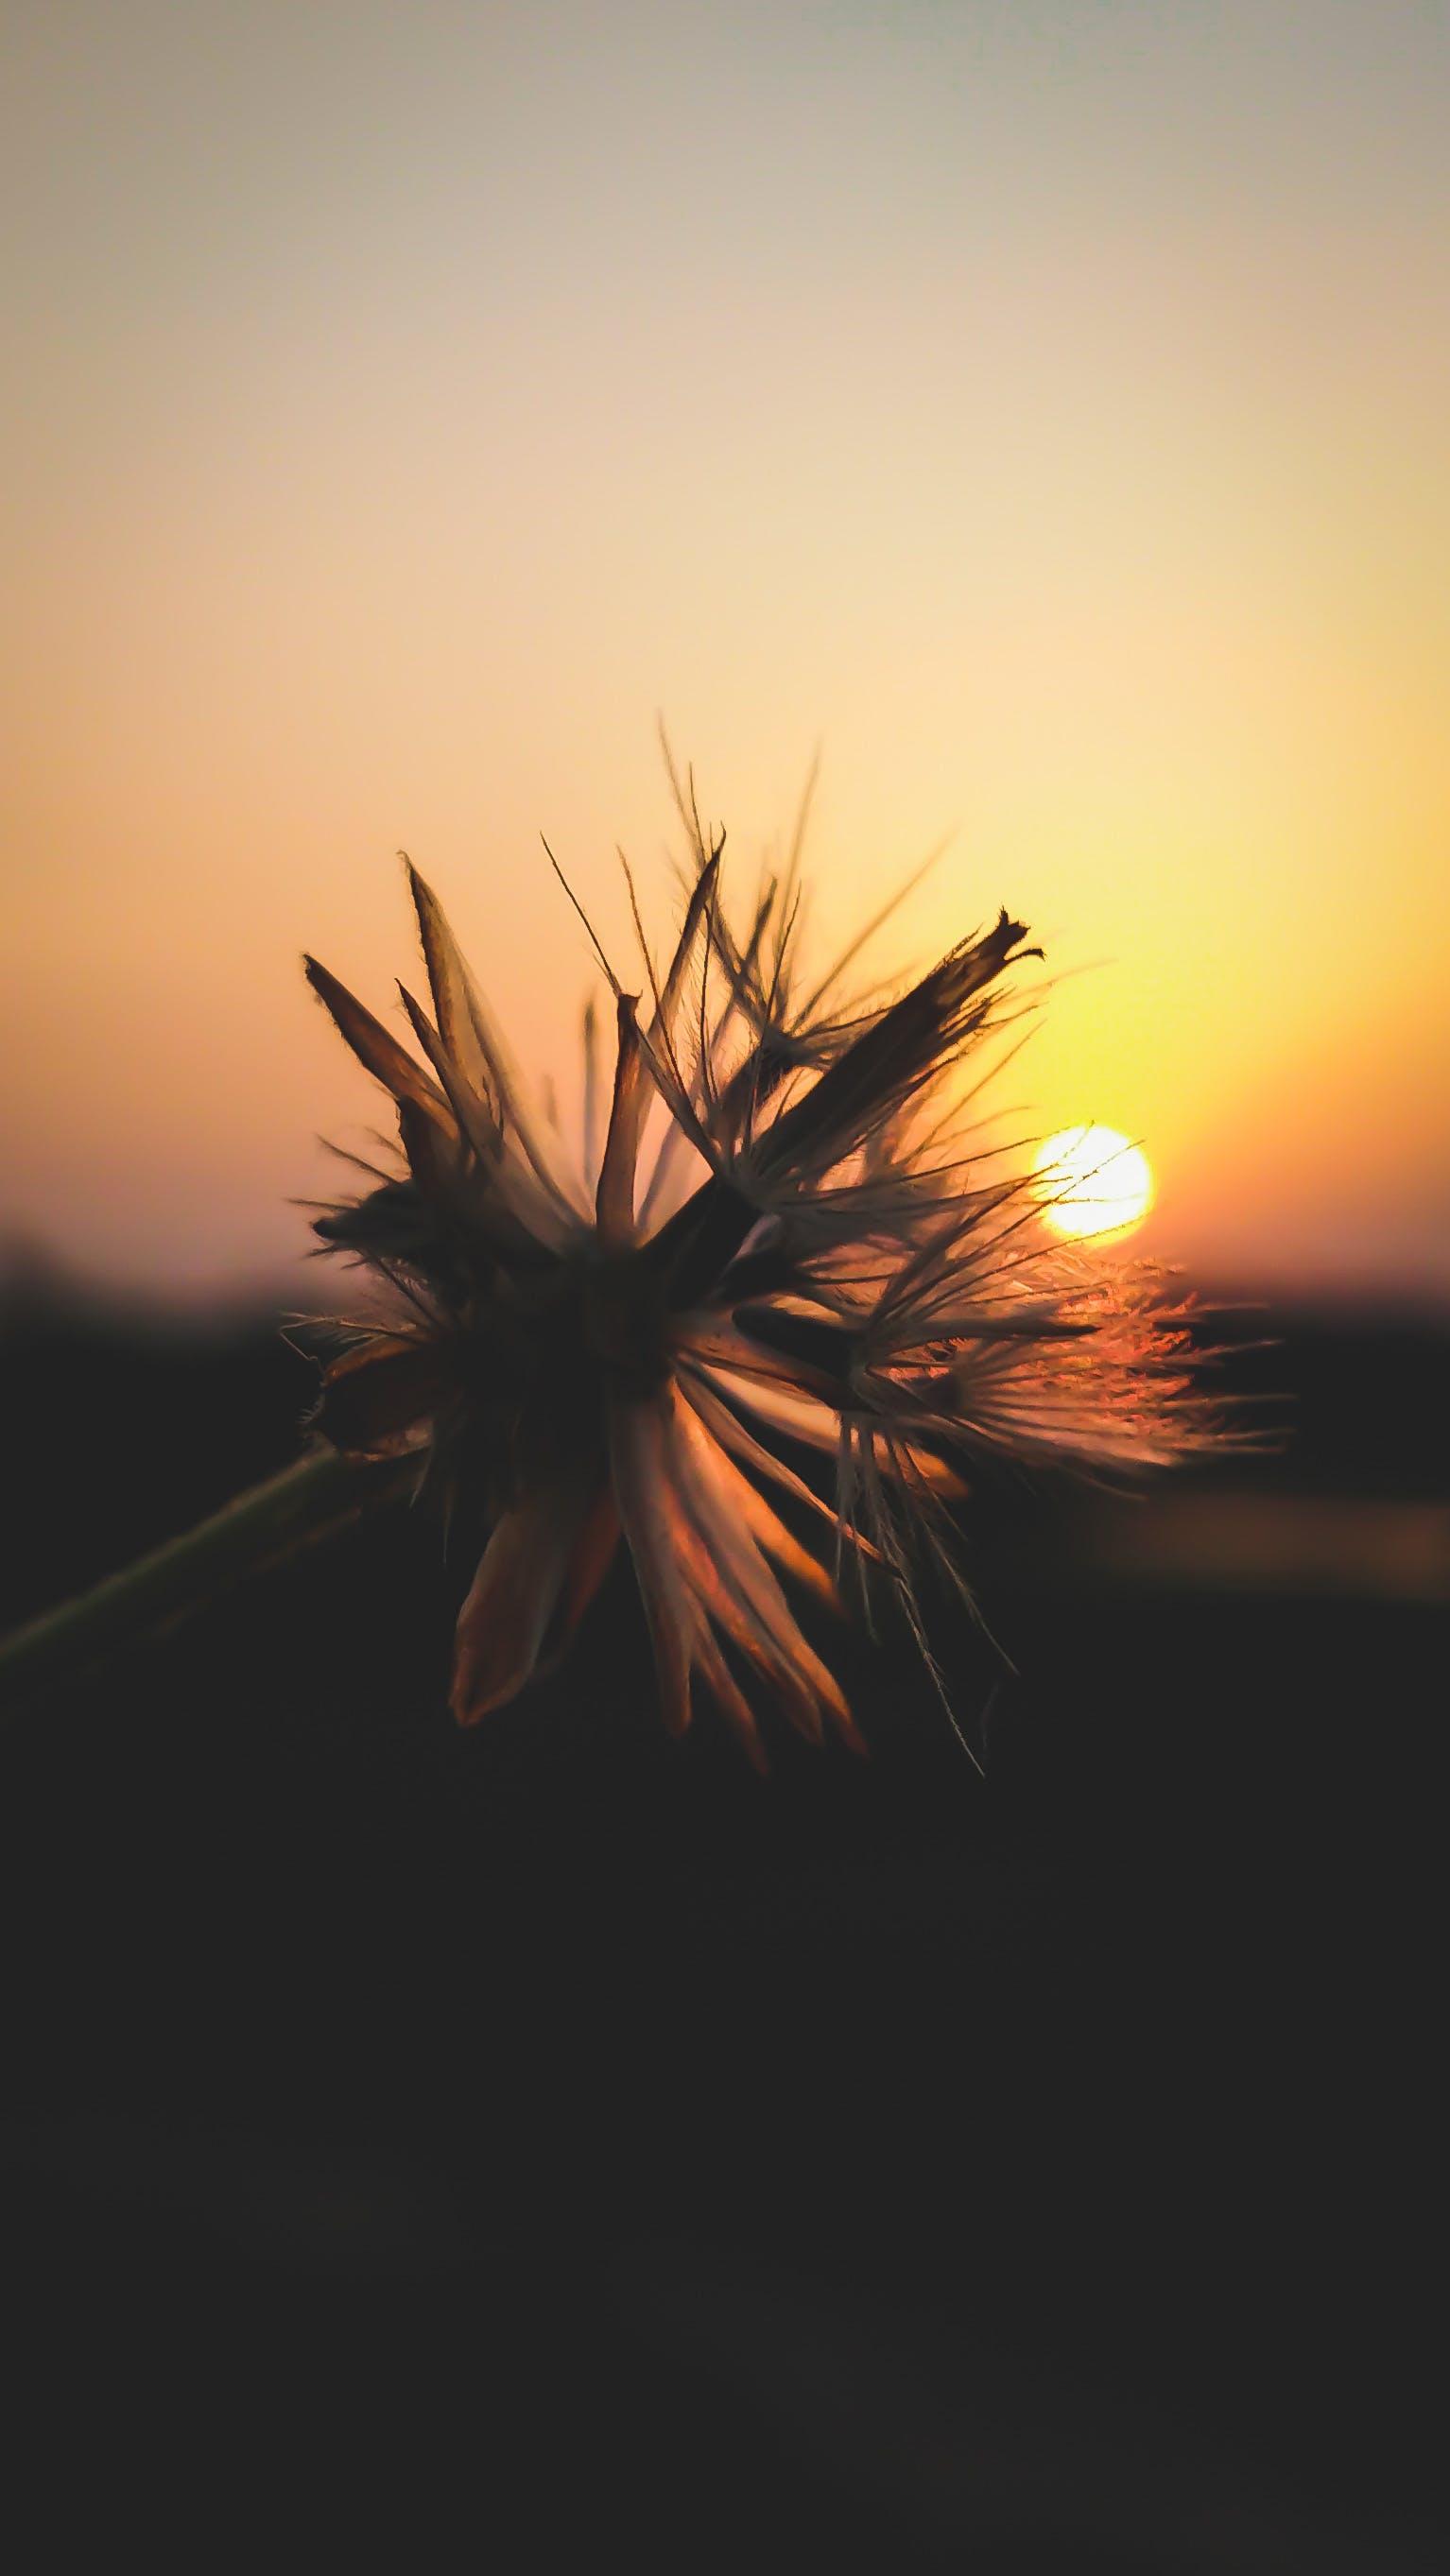 Free stock photo of beautiful flowers, dandelion, evening sun, flower